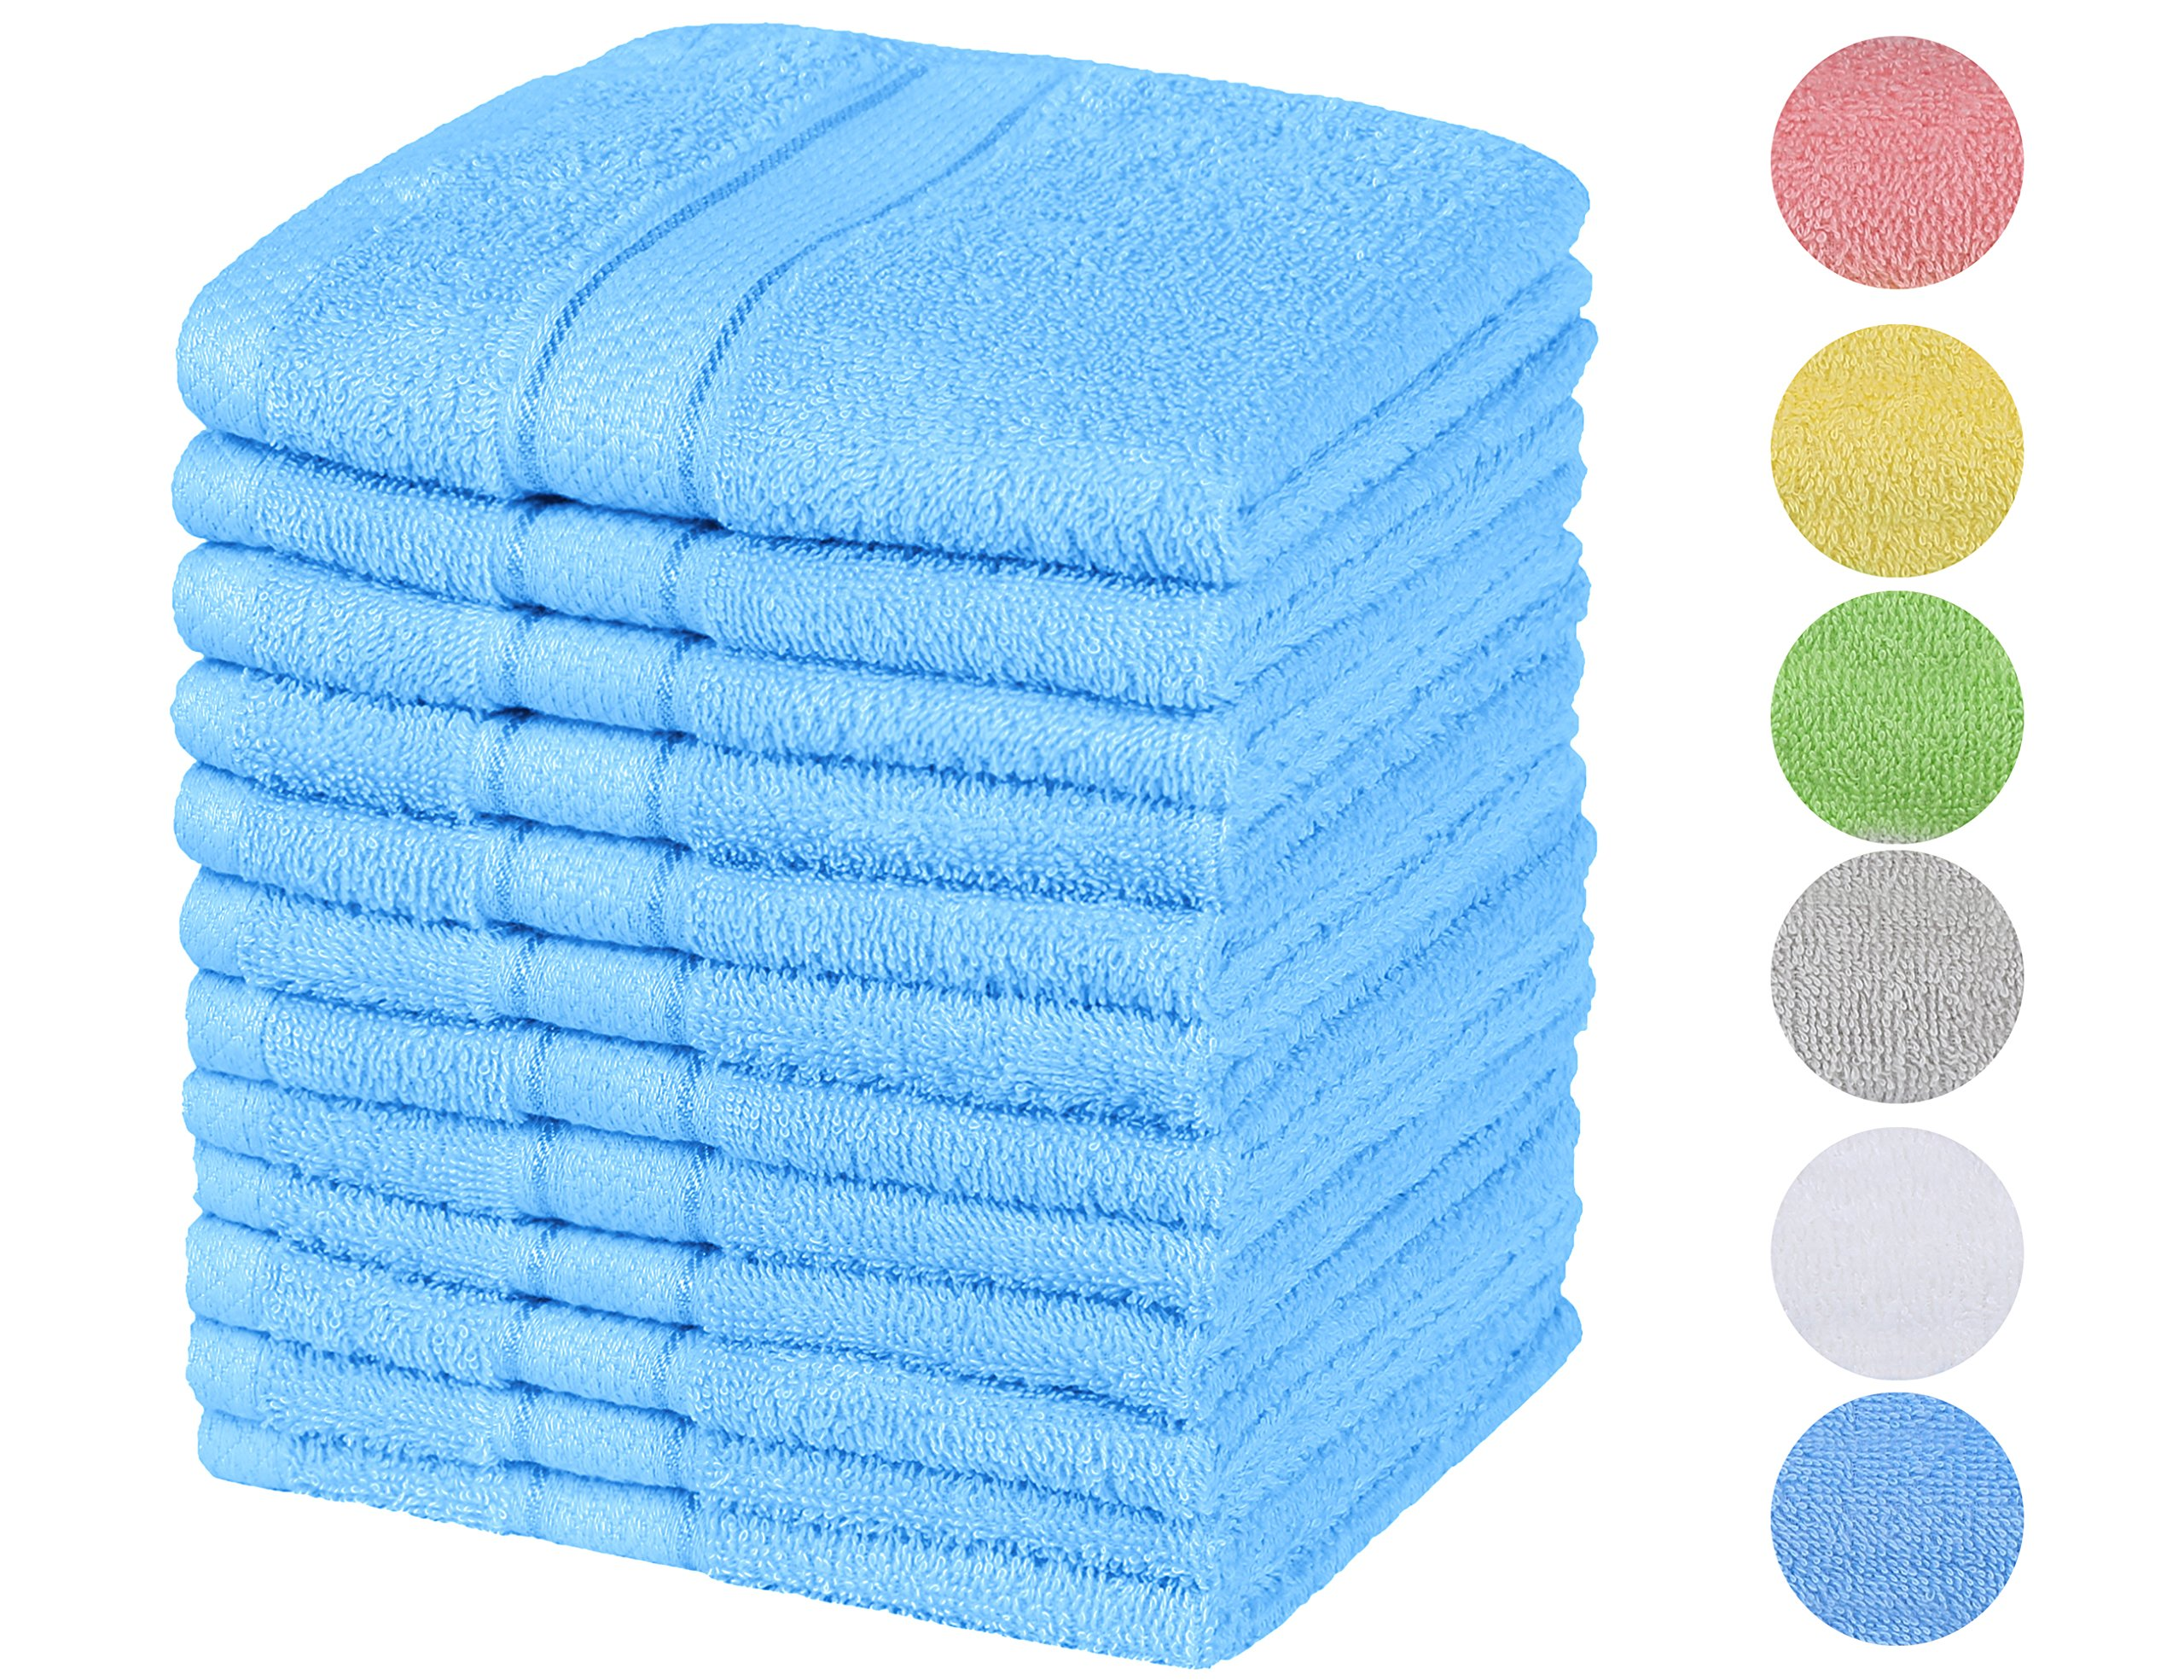 Chama Premium Luxury 100% Cotton Basic Baby & Hotel & Kitchen Hand Towels 13''x13'' Washcloth Set of 12 Pack(Blue)